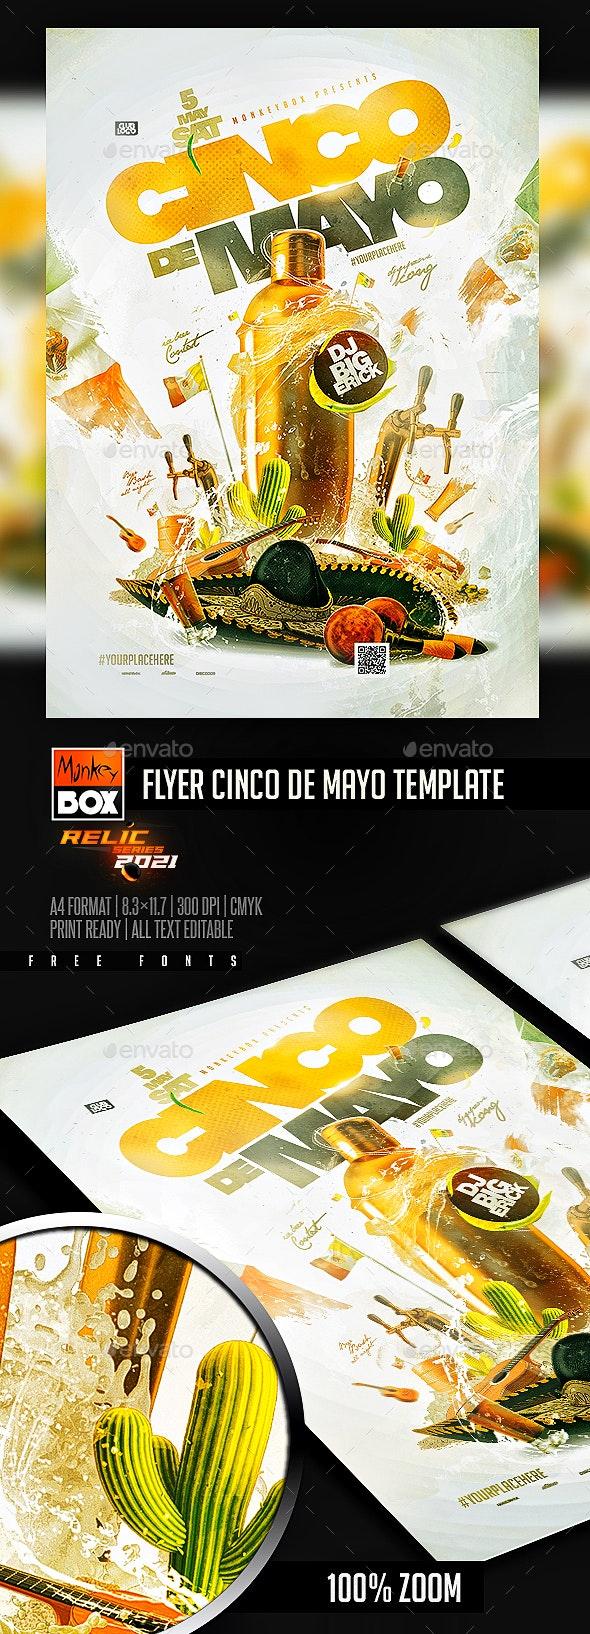 Flyer Cinco De Mayo Template - Events Flyers